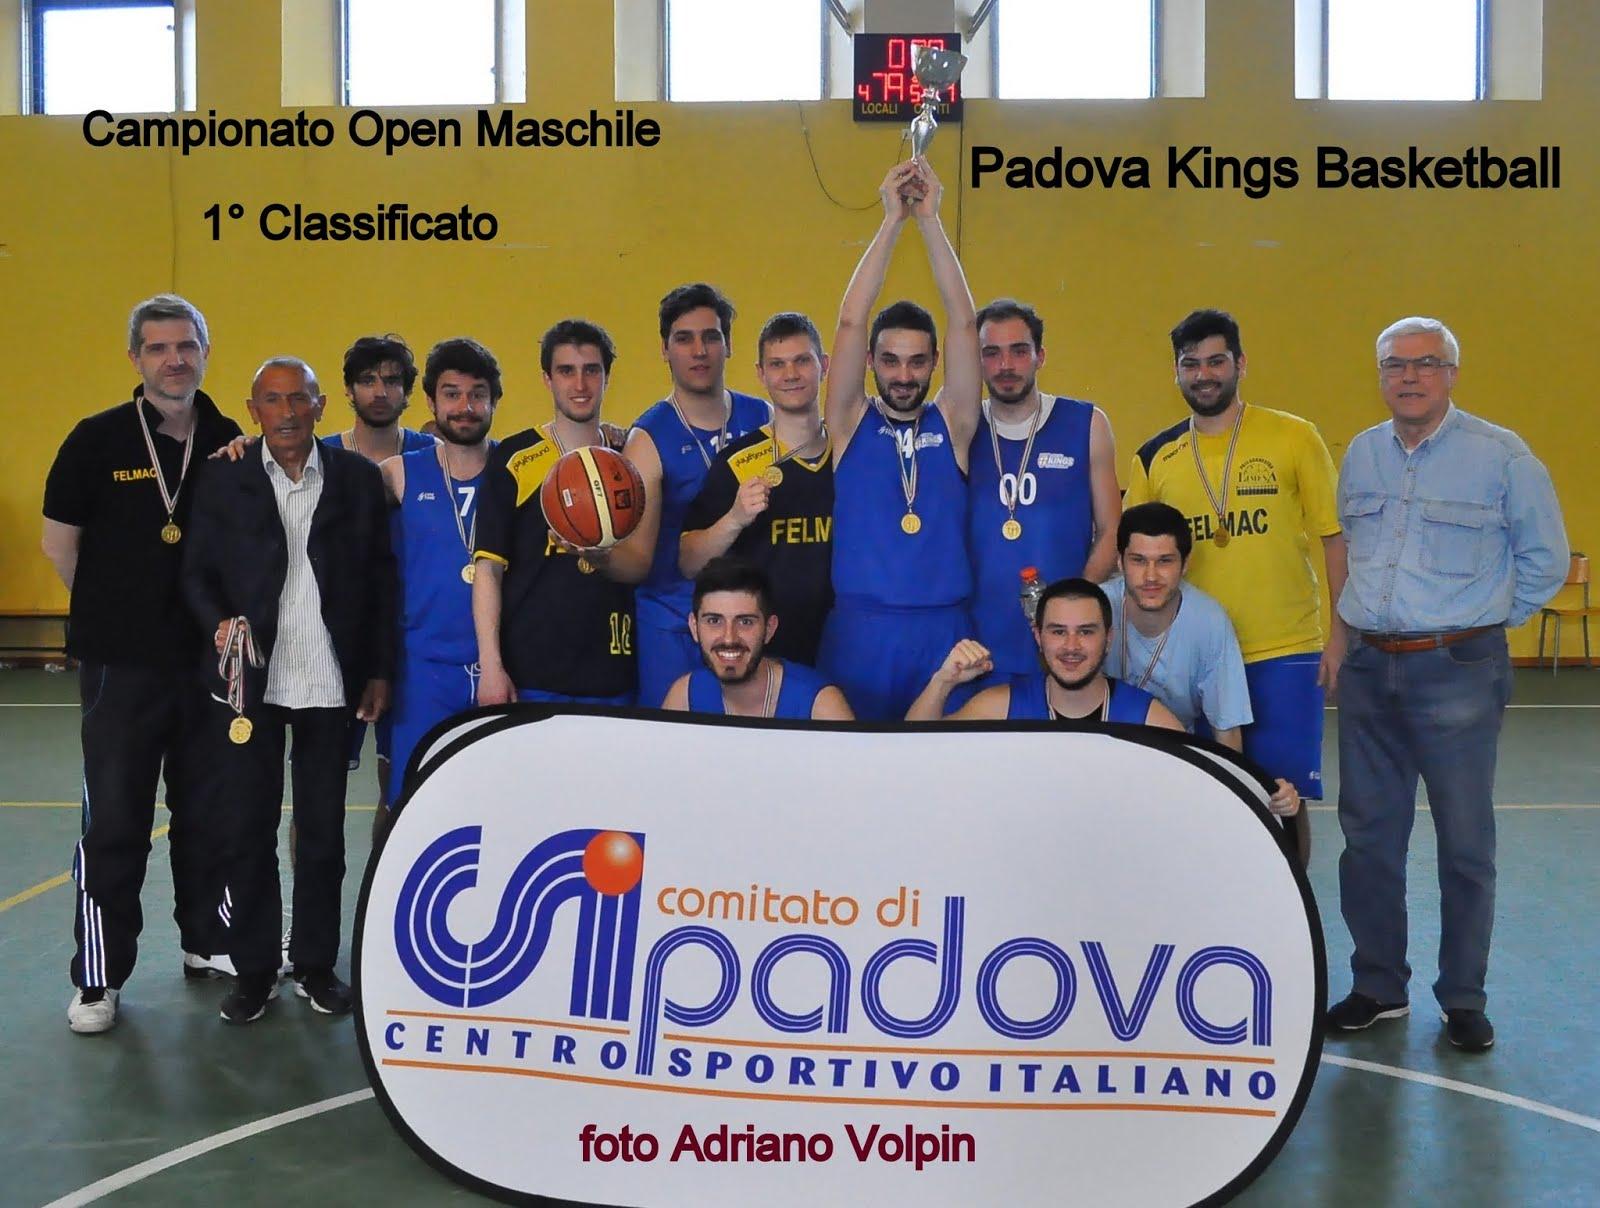 Campionato C.S.I. 2015-2016